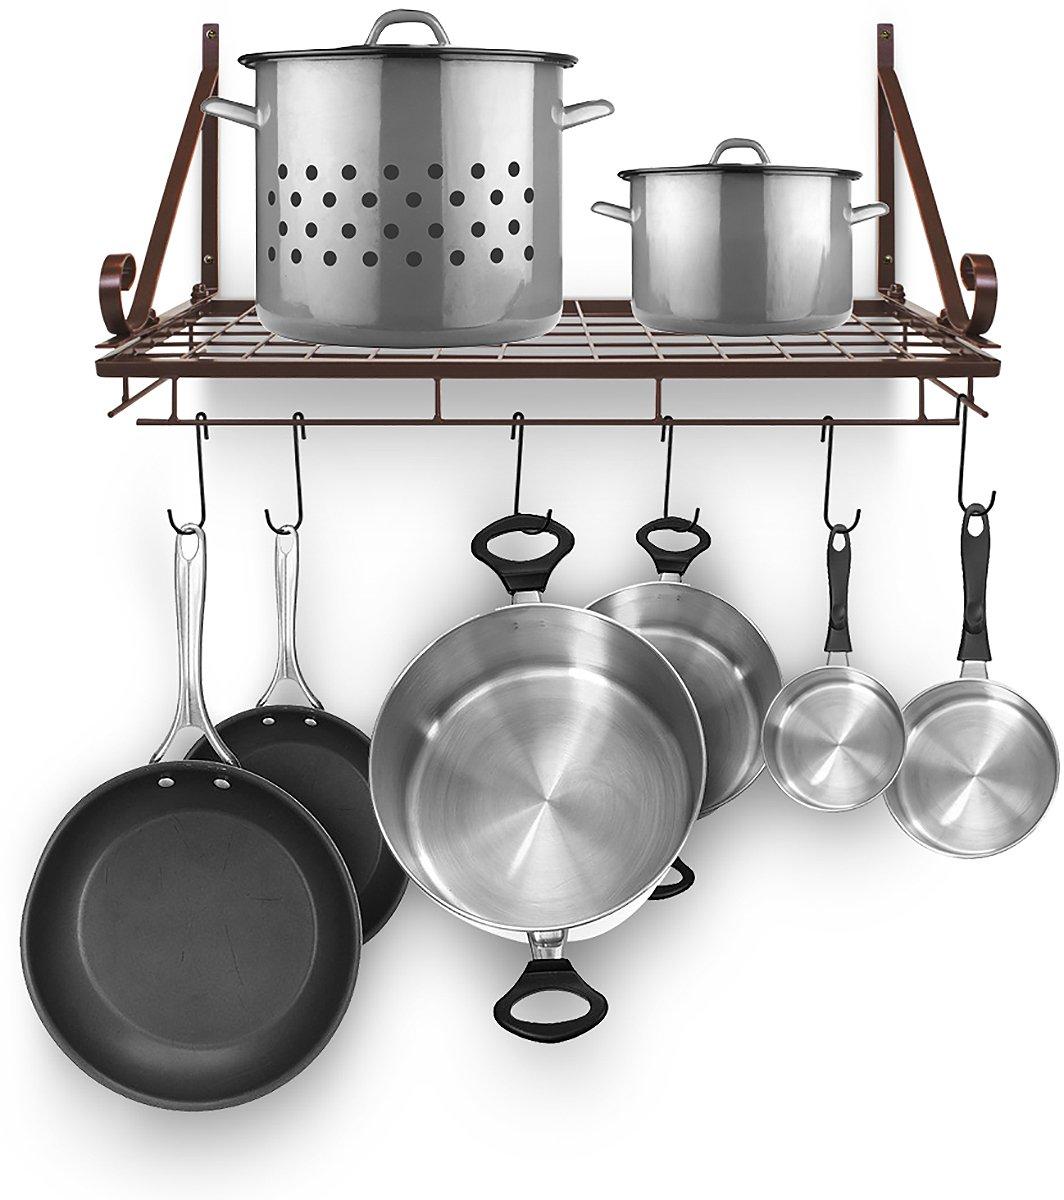 Sorbus Pots and Pan Rack — Decorative Wall Mounted Storage Hanging Rack — Multipurpose Wrought-Iron shelf Organizer for Kitchen Cookware, Utensils, Pans, Books, Bathroom (Wall Rack - Bronze)